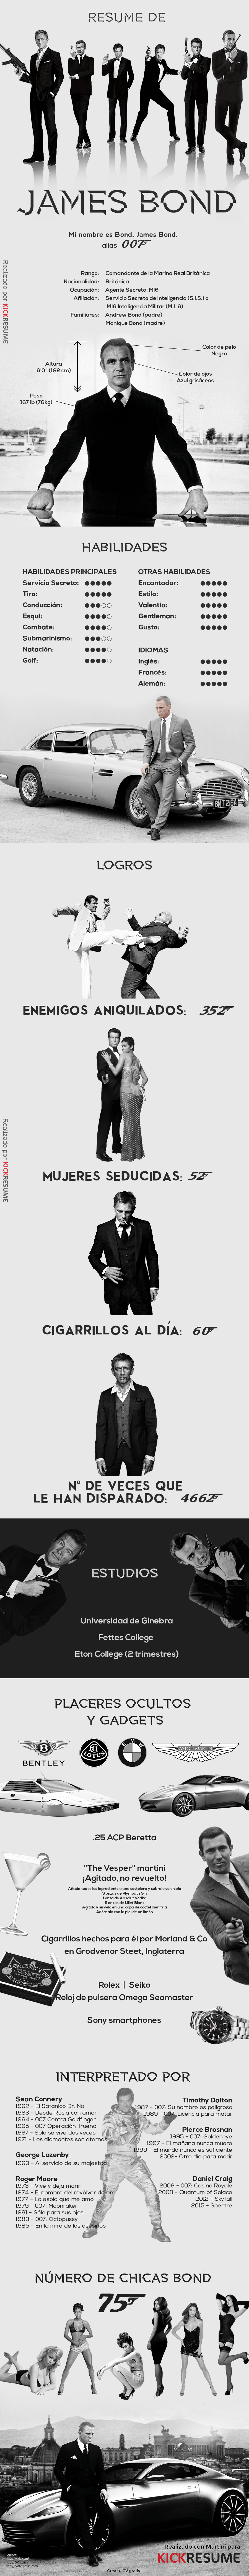 James Bond resume ES